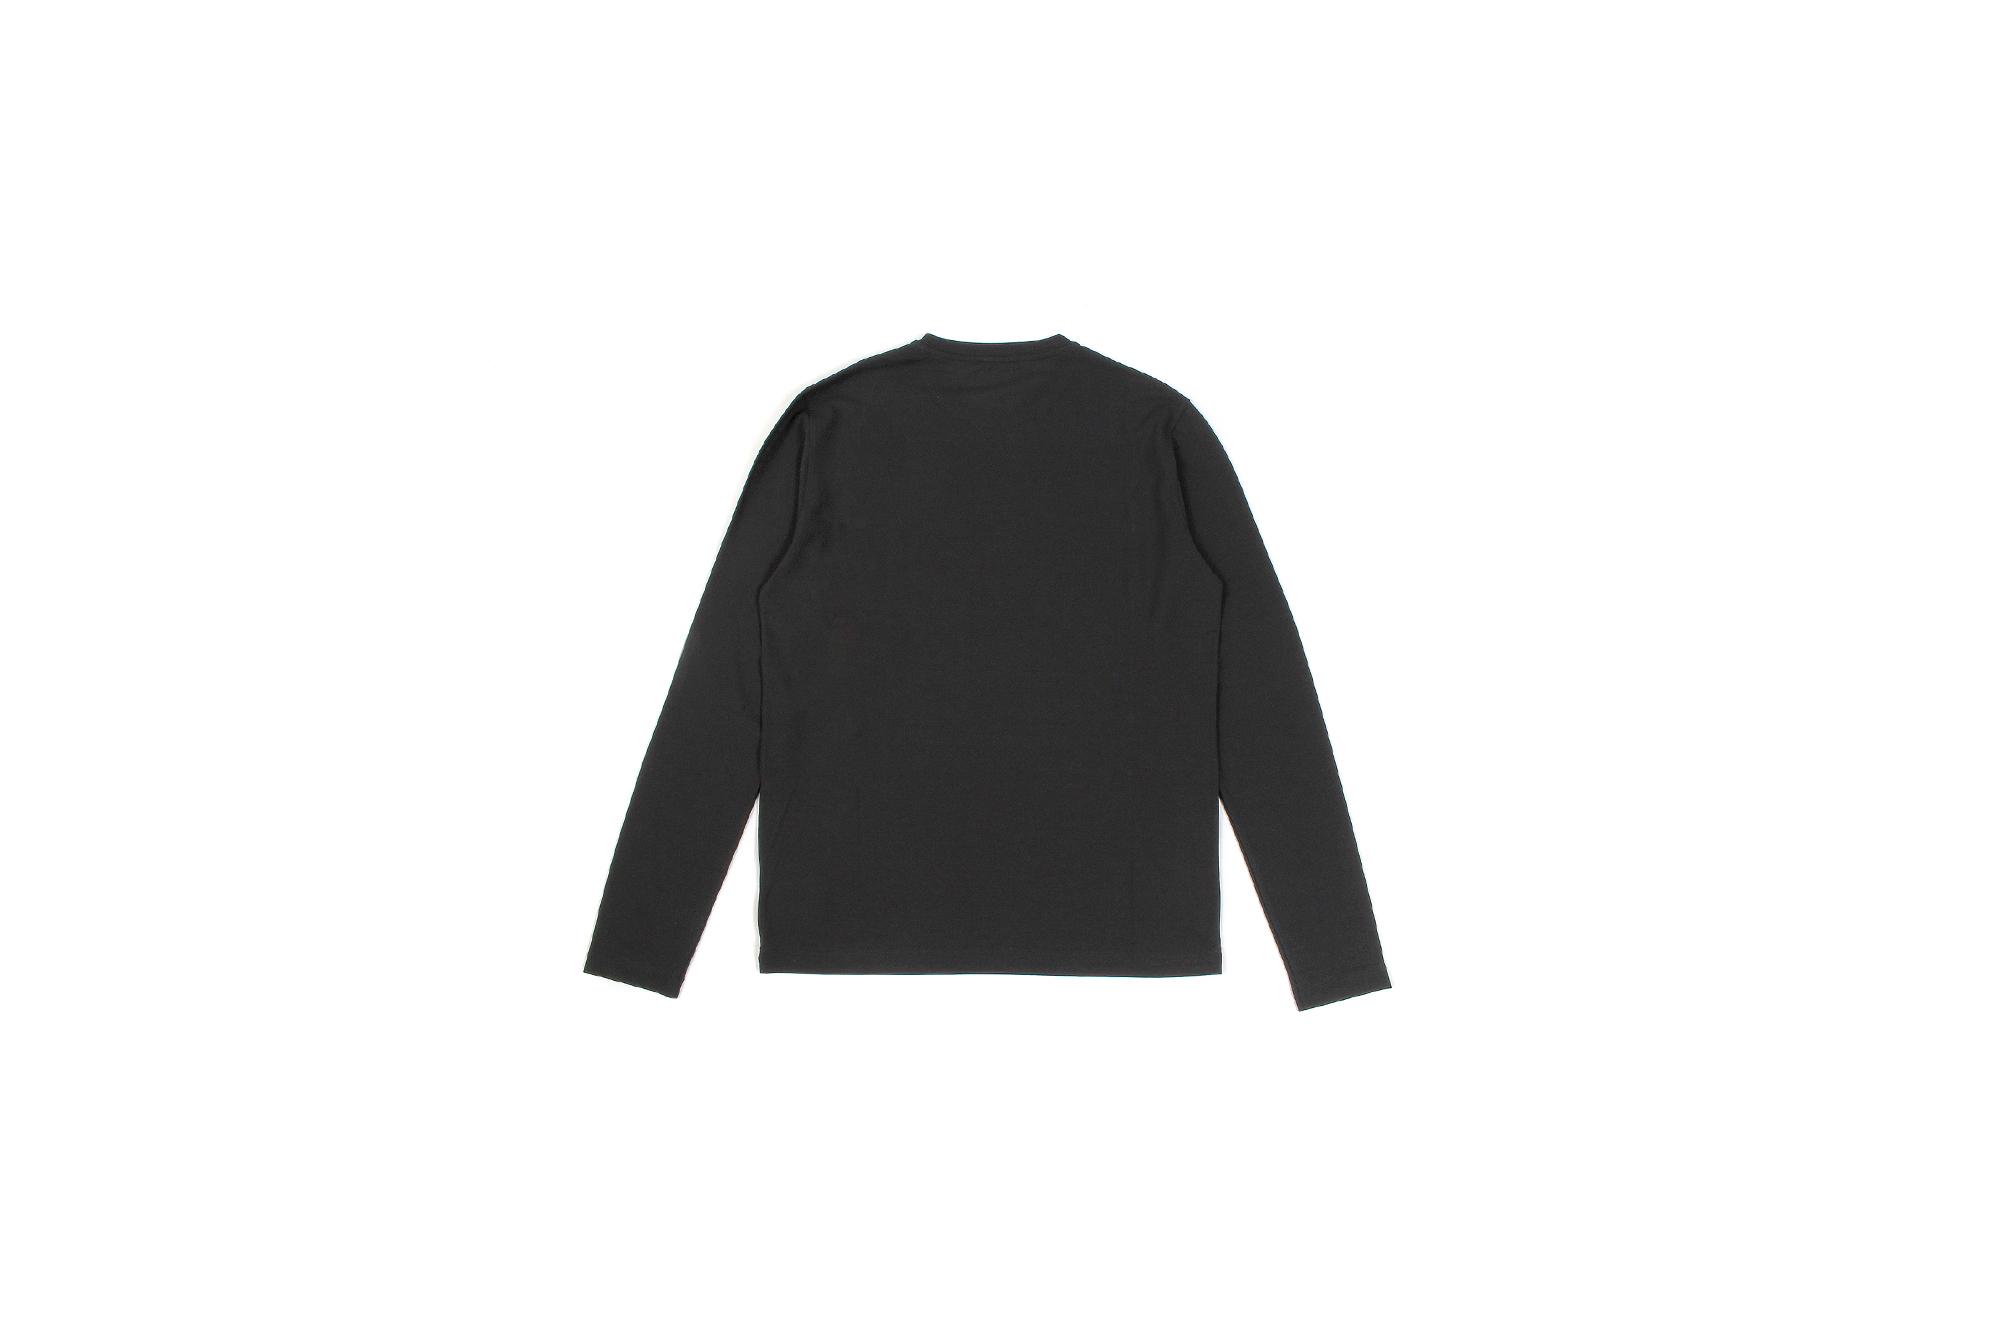 ZANONE (ザノーネ) Long Sleeve Crew Neck T-shirt (ロングスリーブ クルーネック Tシャツ) ice cotton アイスコットン ロングスリーブ Tシャツ BLACK (ブラック・Z0015) MADE IN ITALY(イタリア製) 2021 春夏新作 愛知 名古屋 Alto e Diritto altoediritto アルトエデリット ロンT